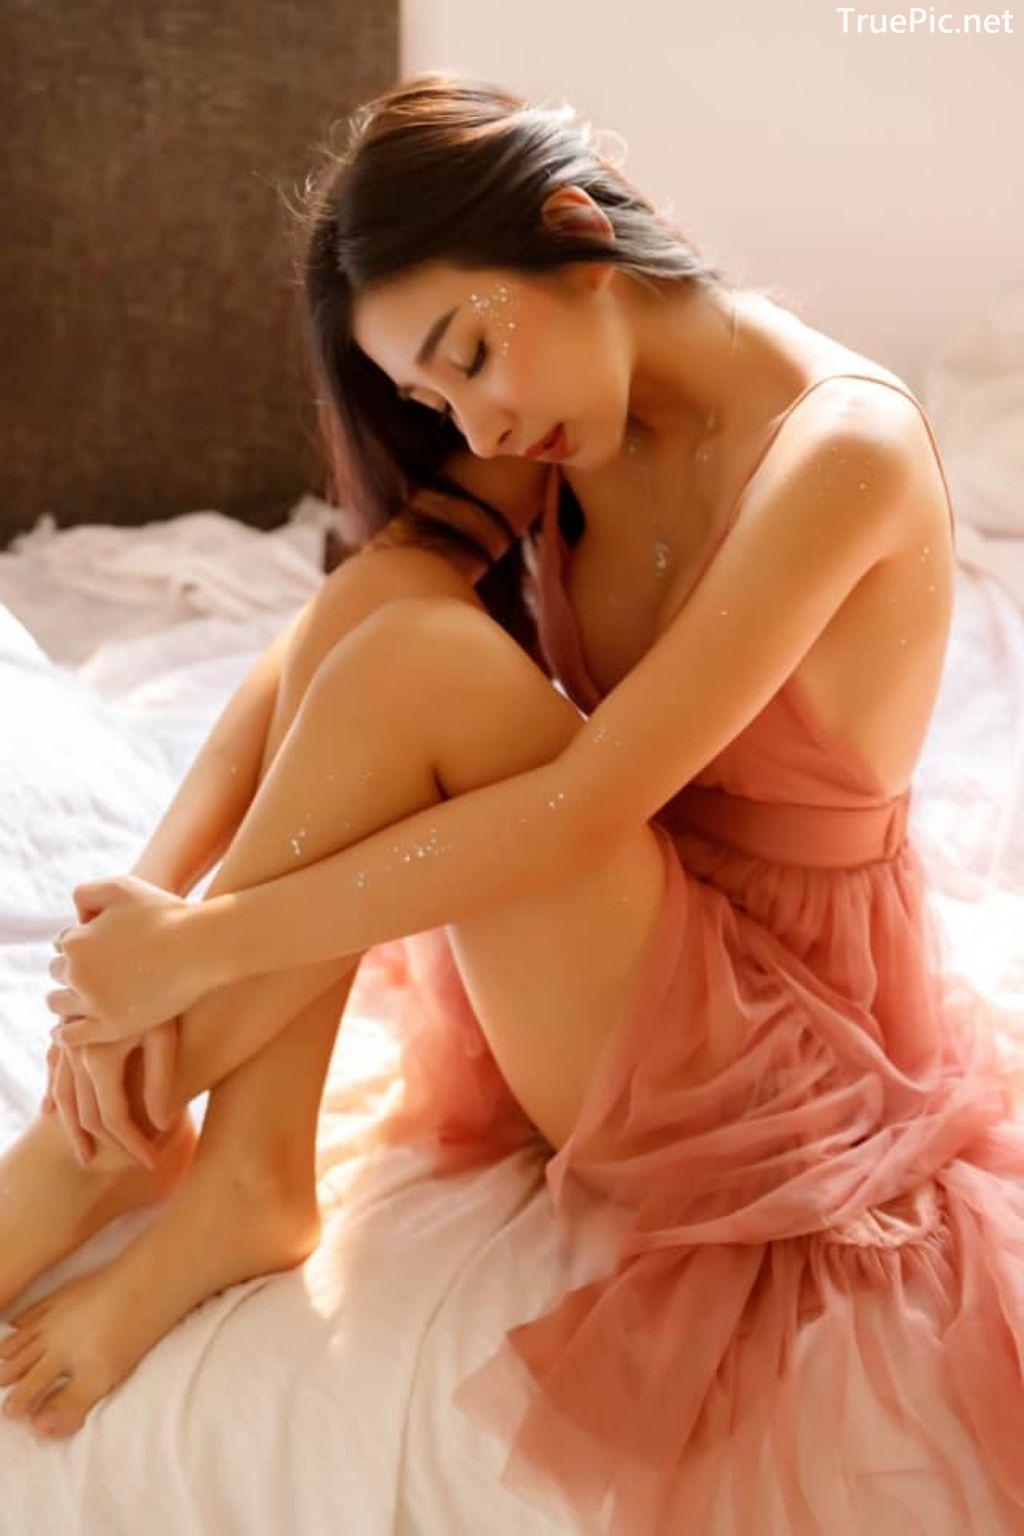 Image-Thailand-Sexy-Model-Pattamaporn-Keawkum-Morning-Sunlight-TruePic.net- Picture-3